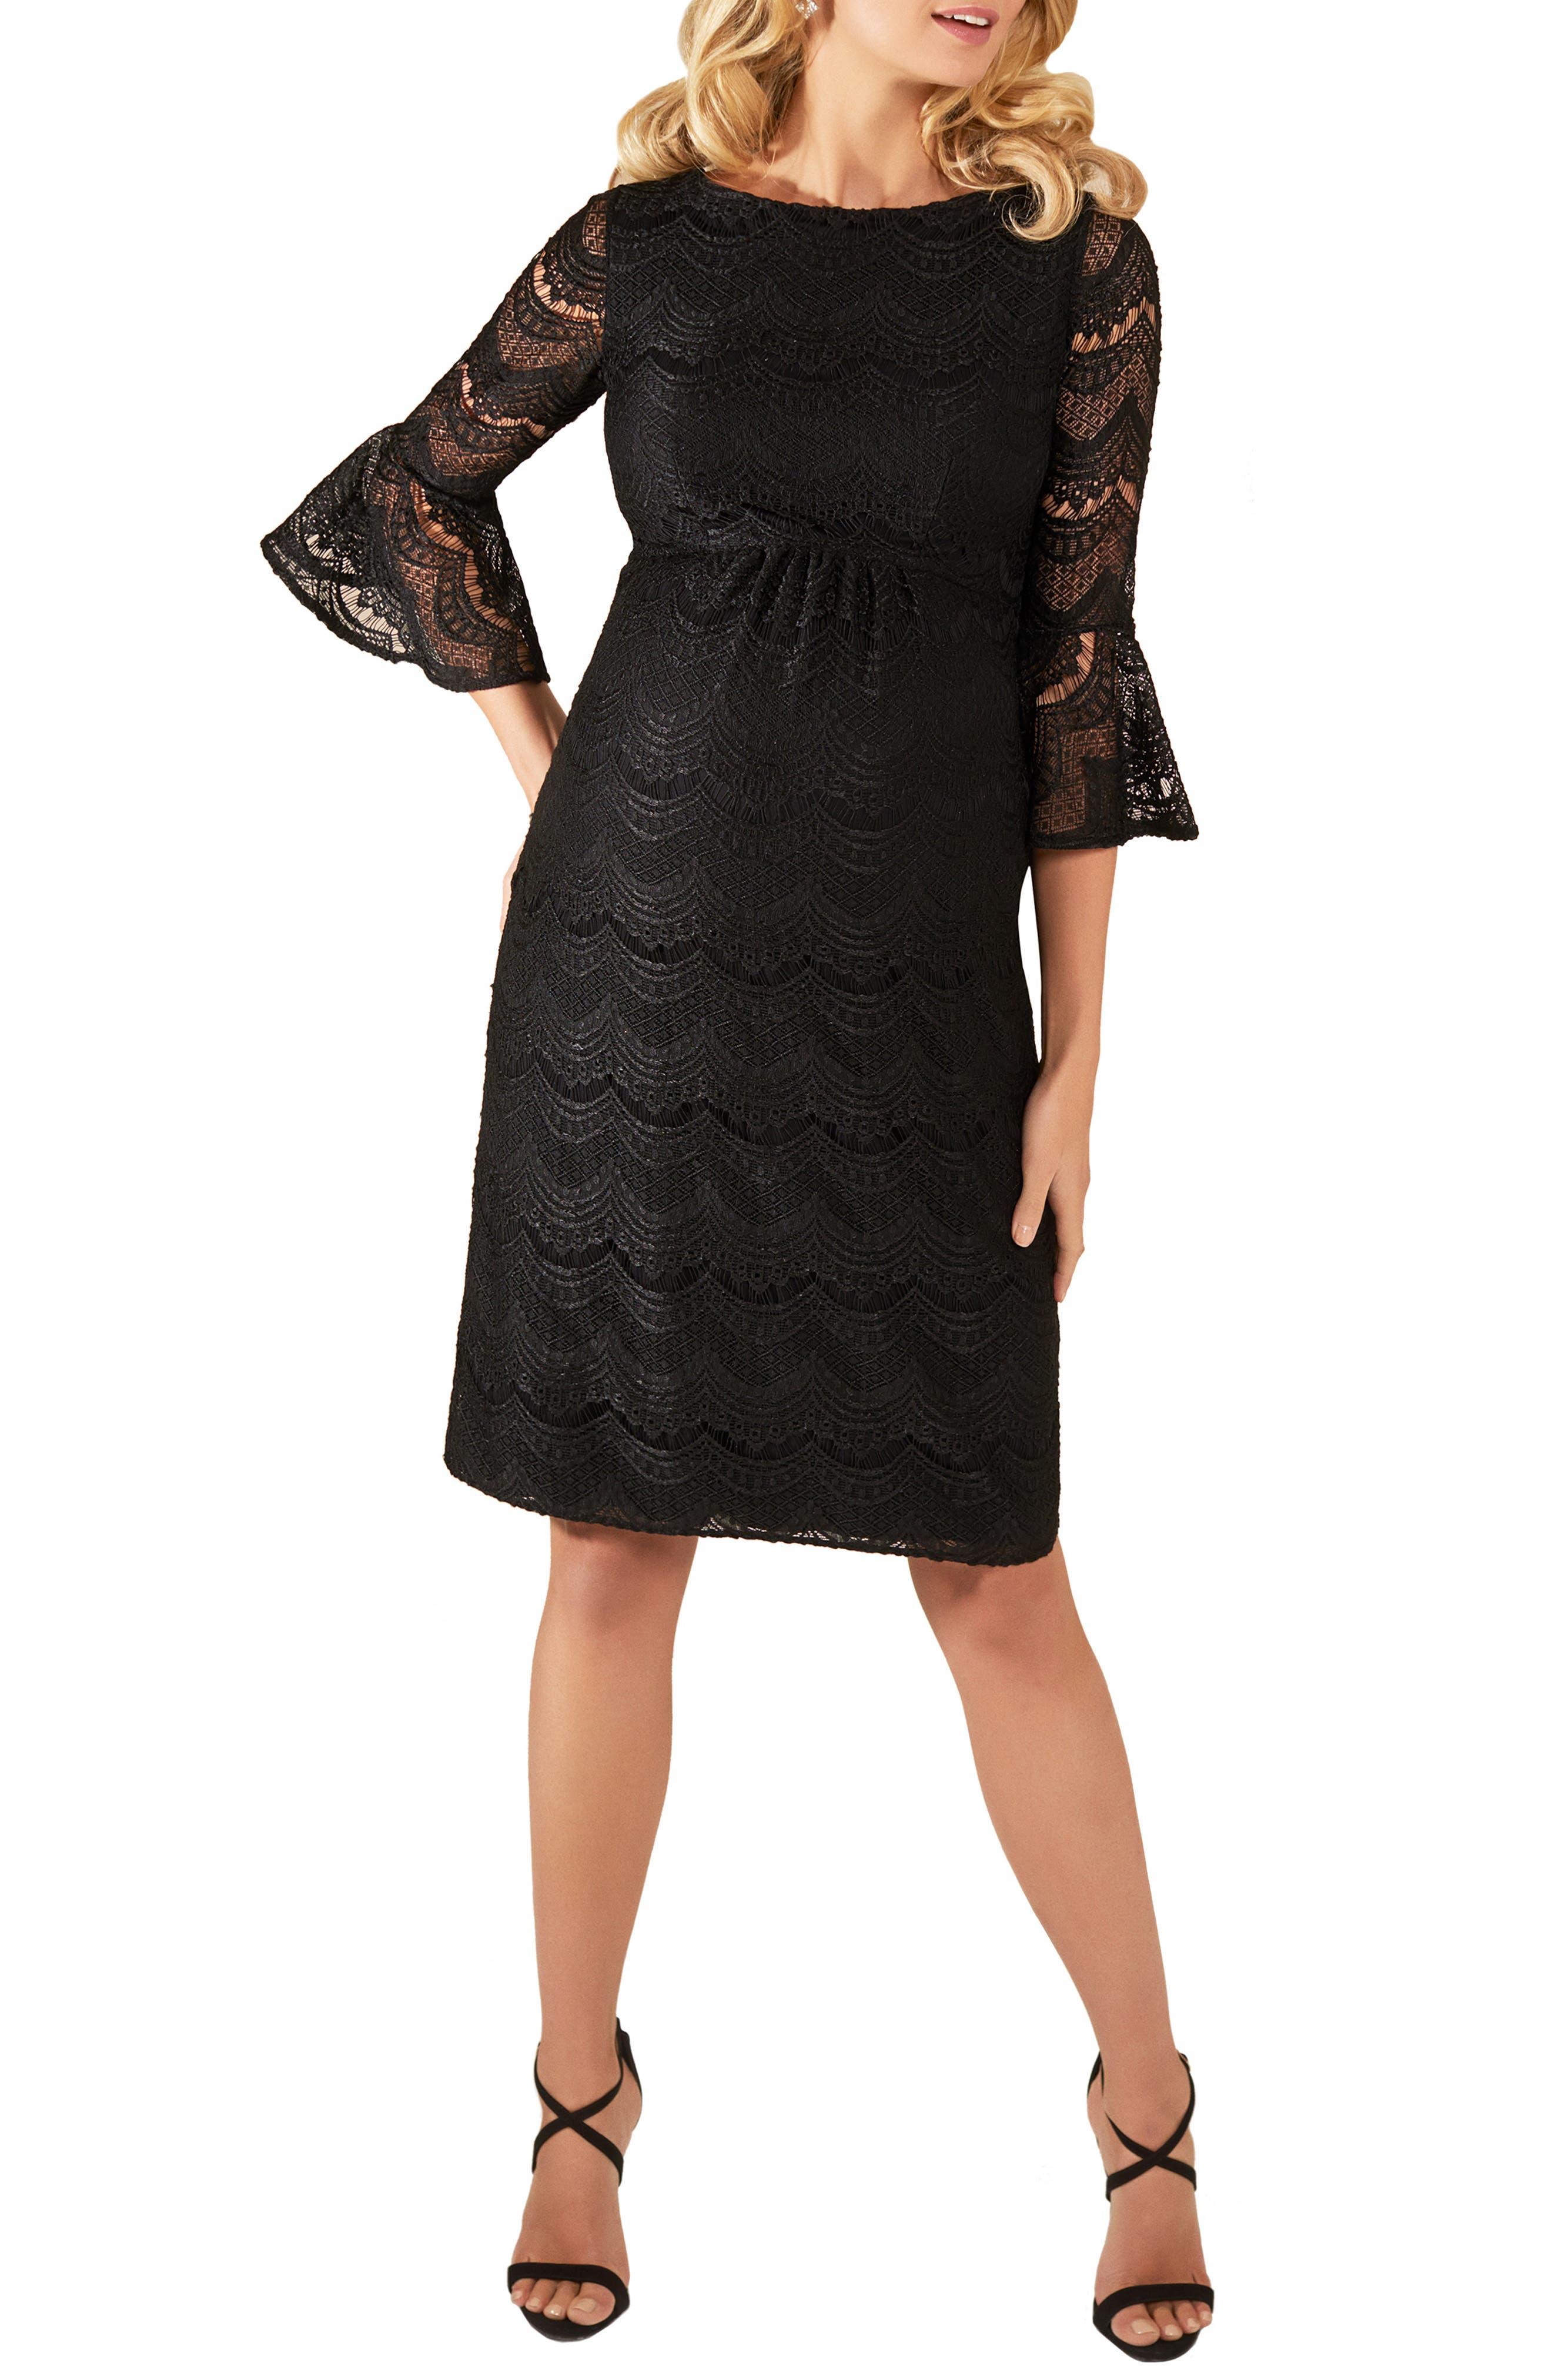 TIFFANY ROSE,                             Jane Lace Maternity Dress,                             Main thumbnail 1, color,                             BLACK